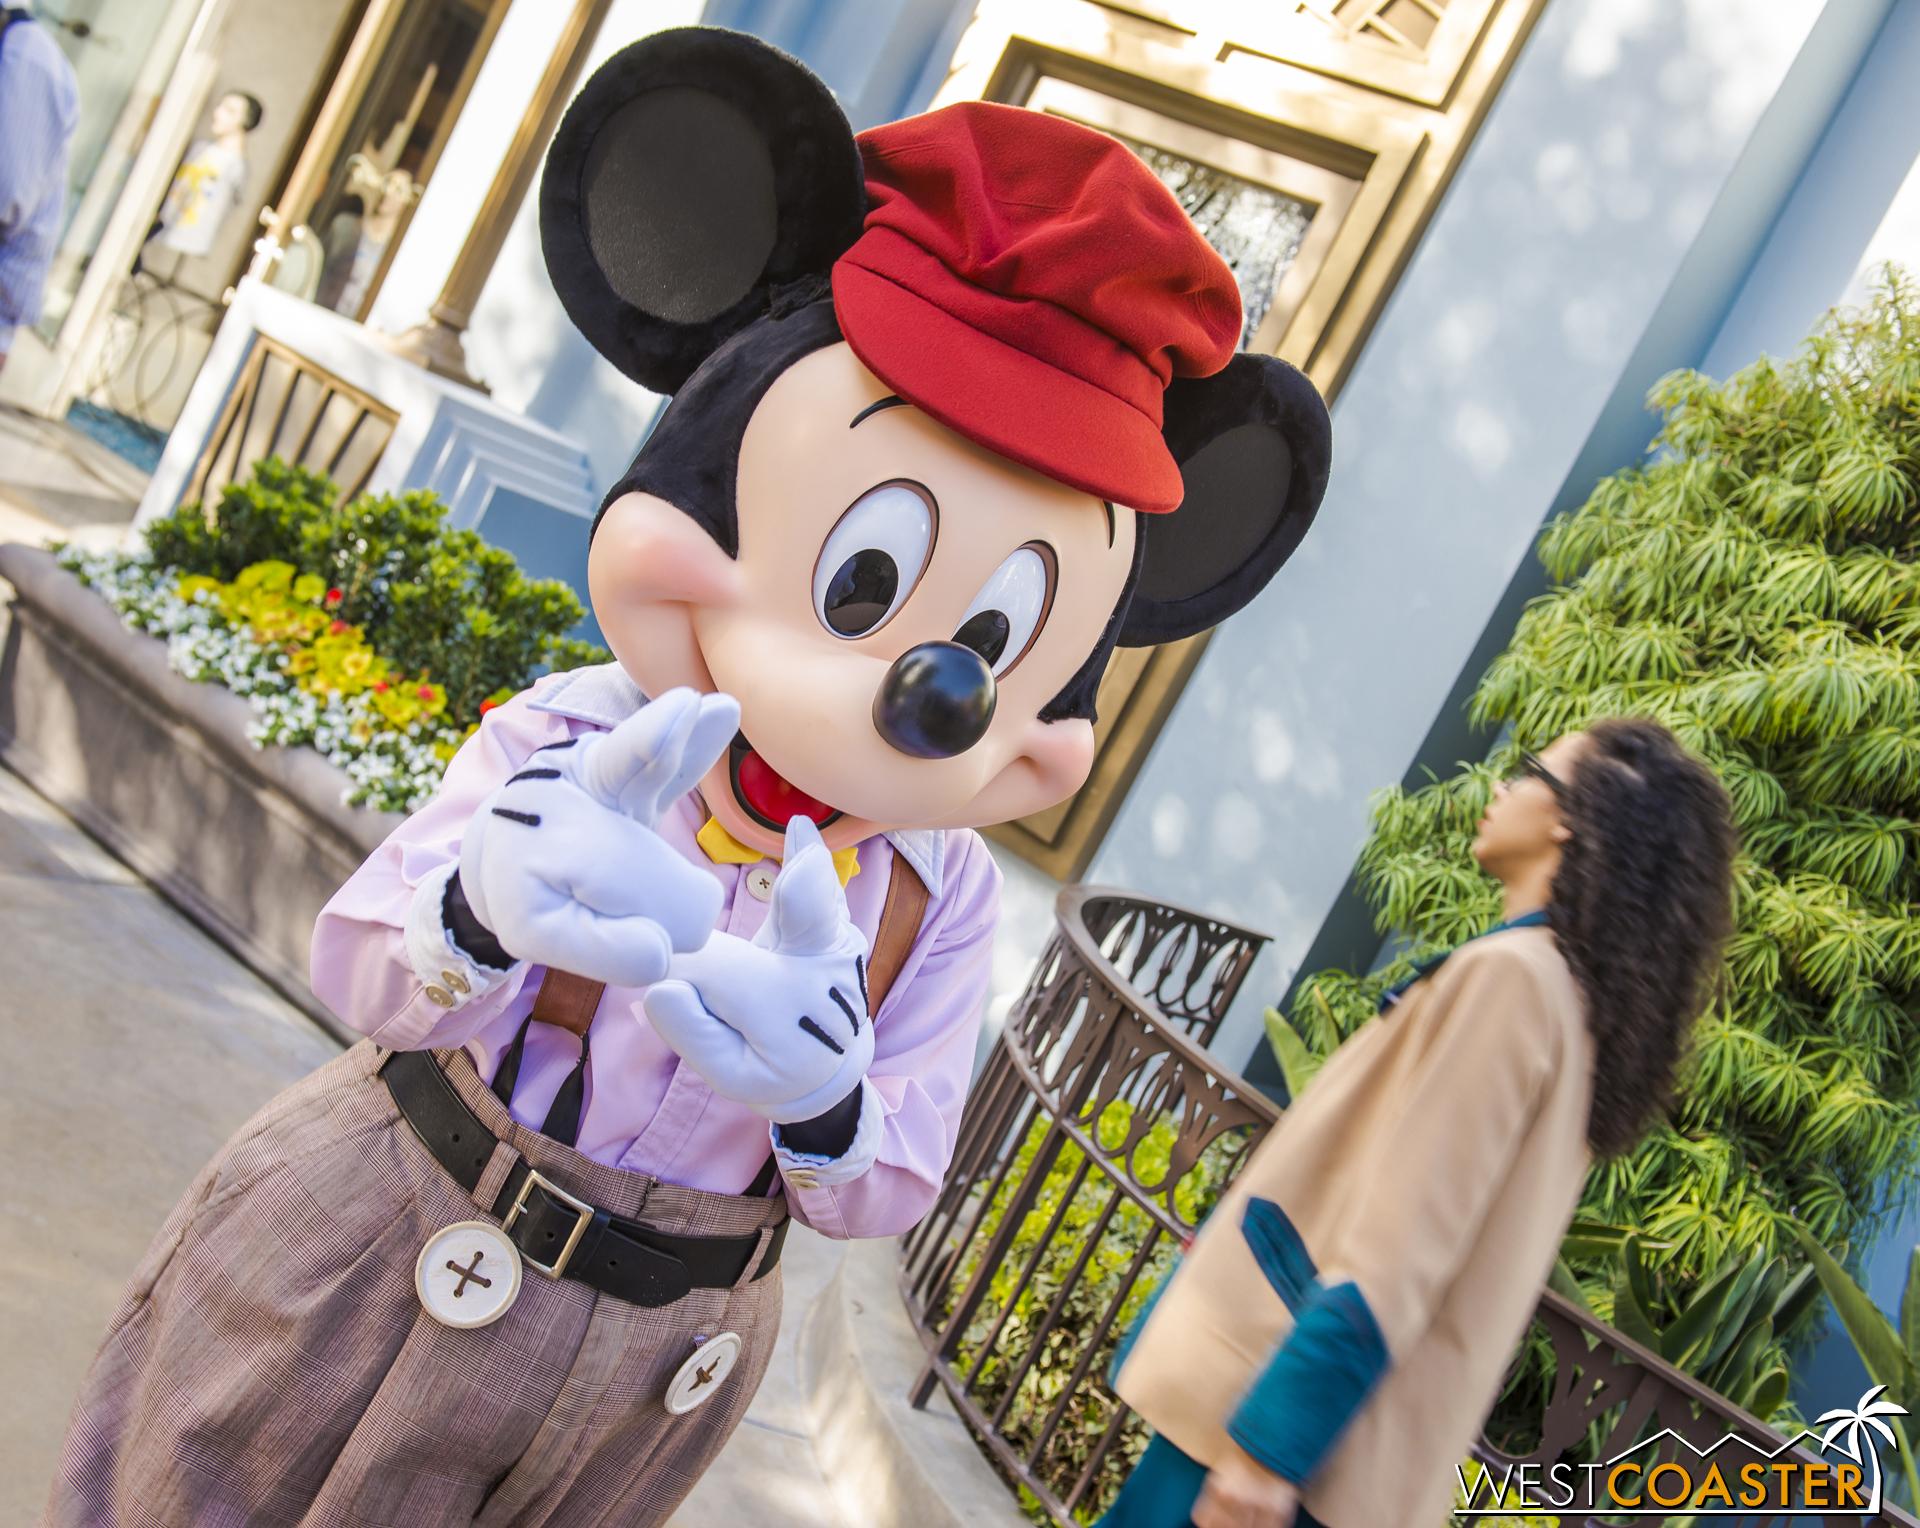 Mickey seemed to like what he saw.